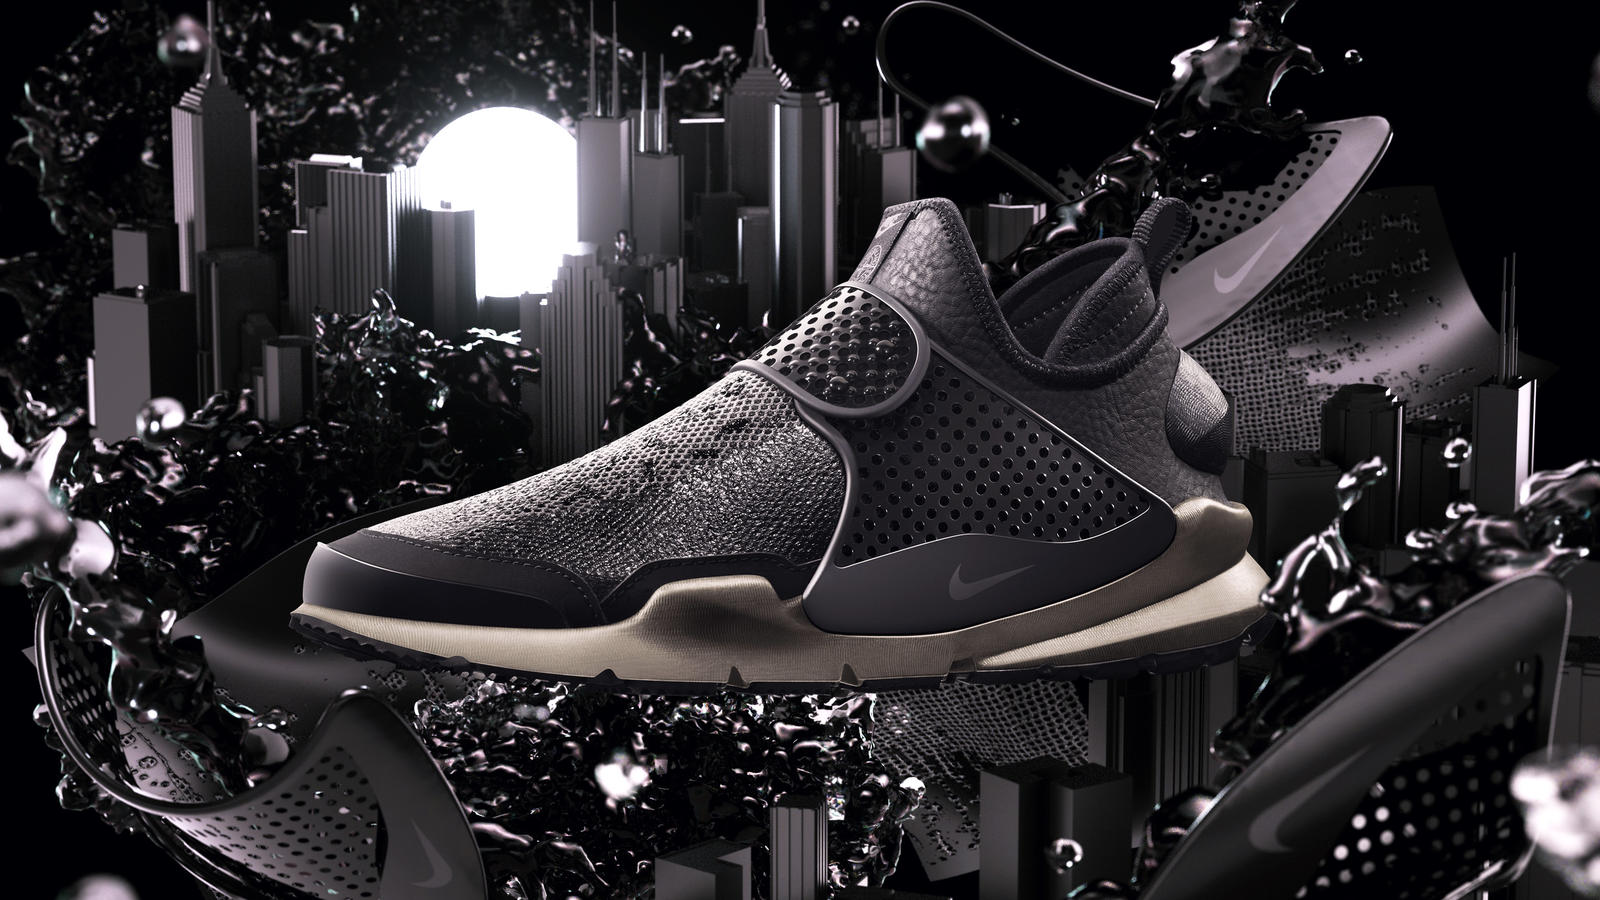 The NikeLab Sock Dart Mid x Stone